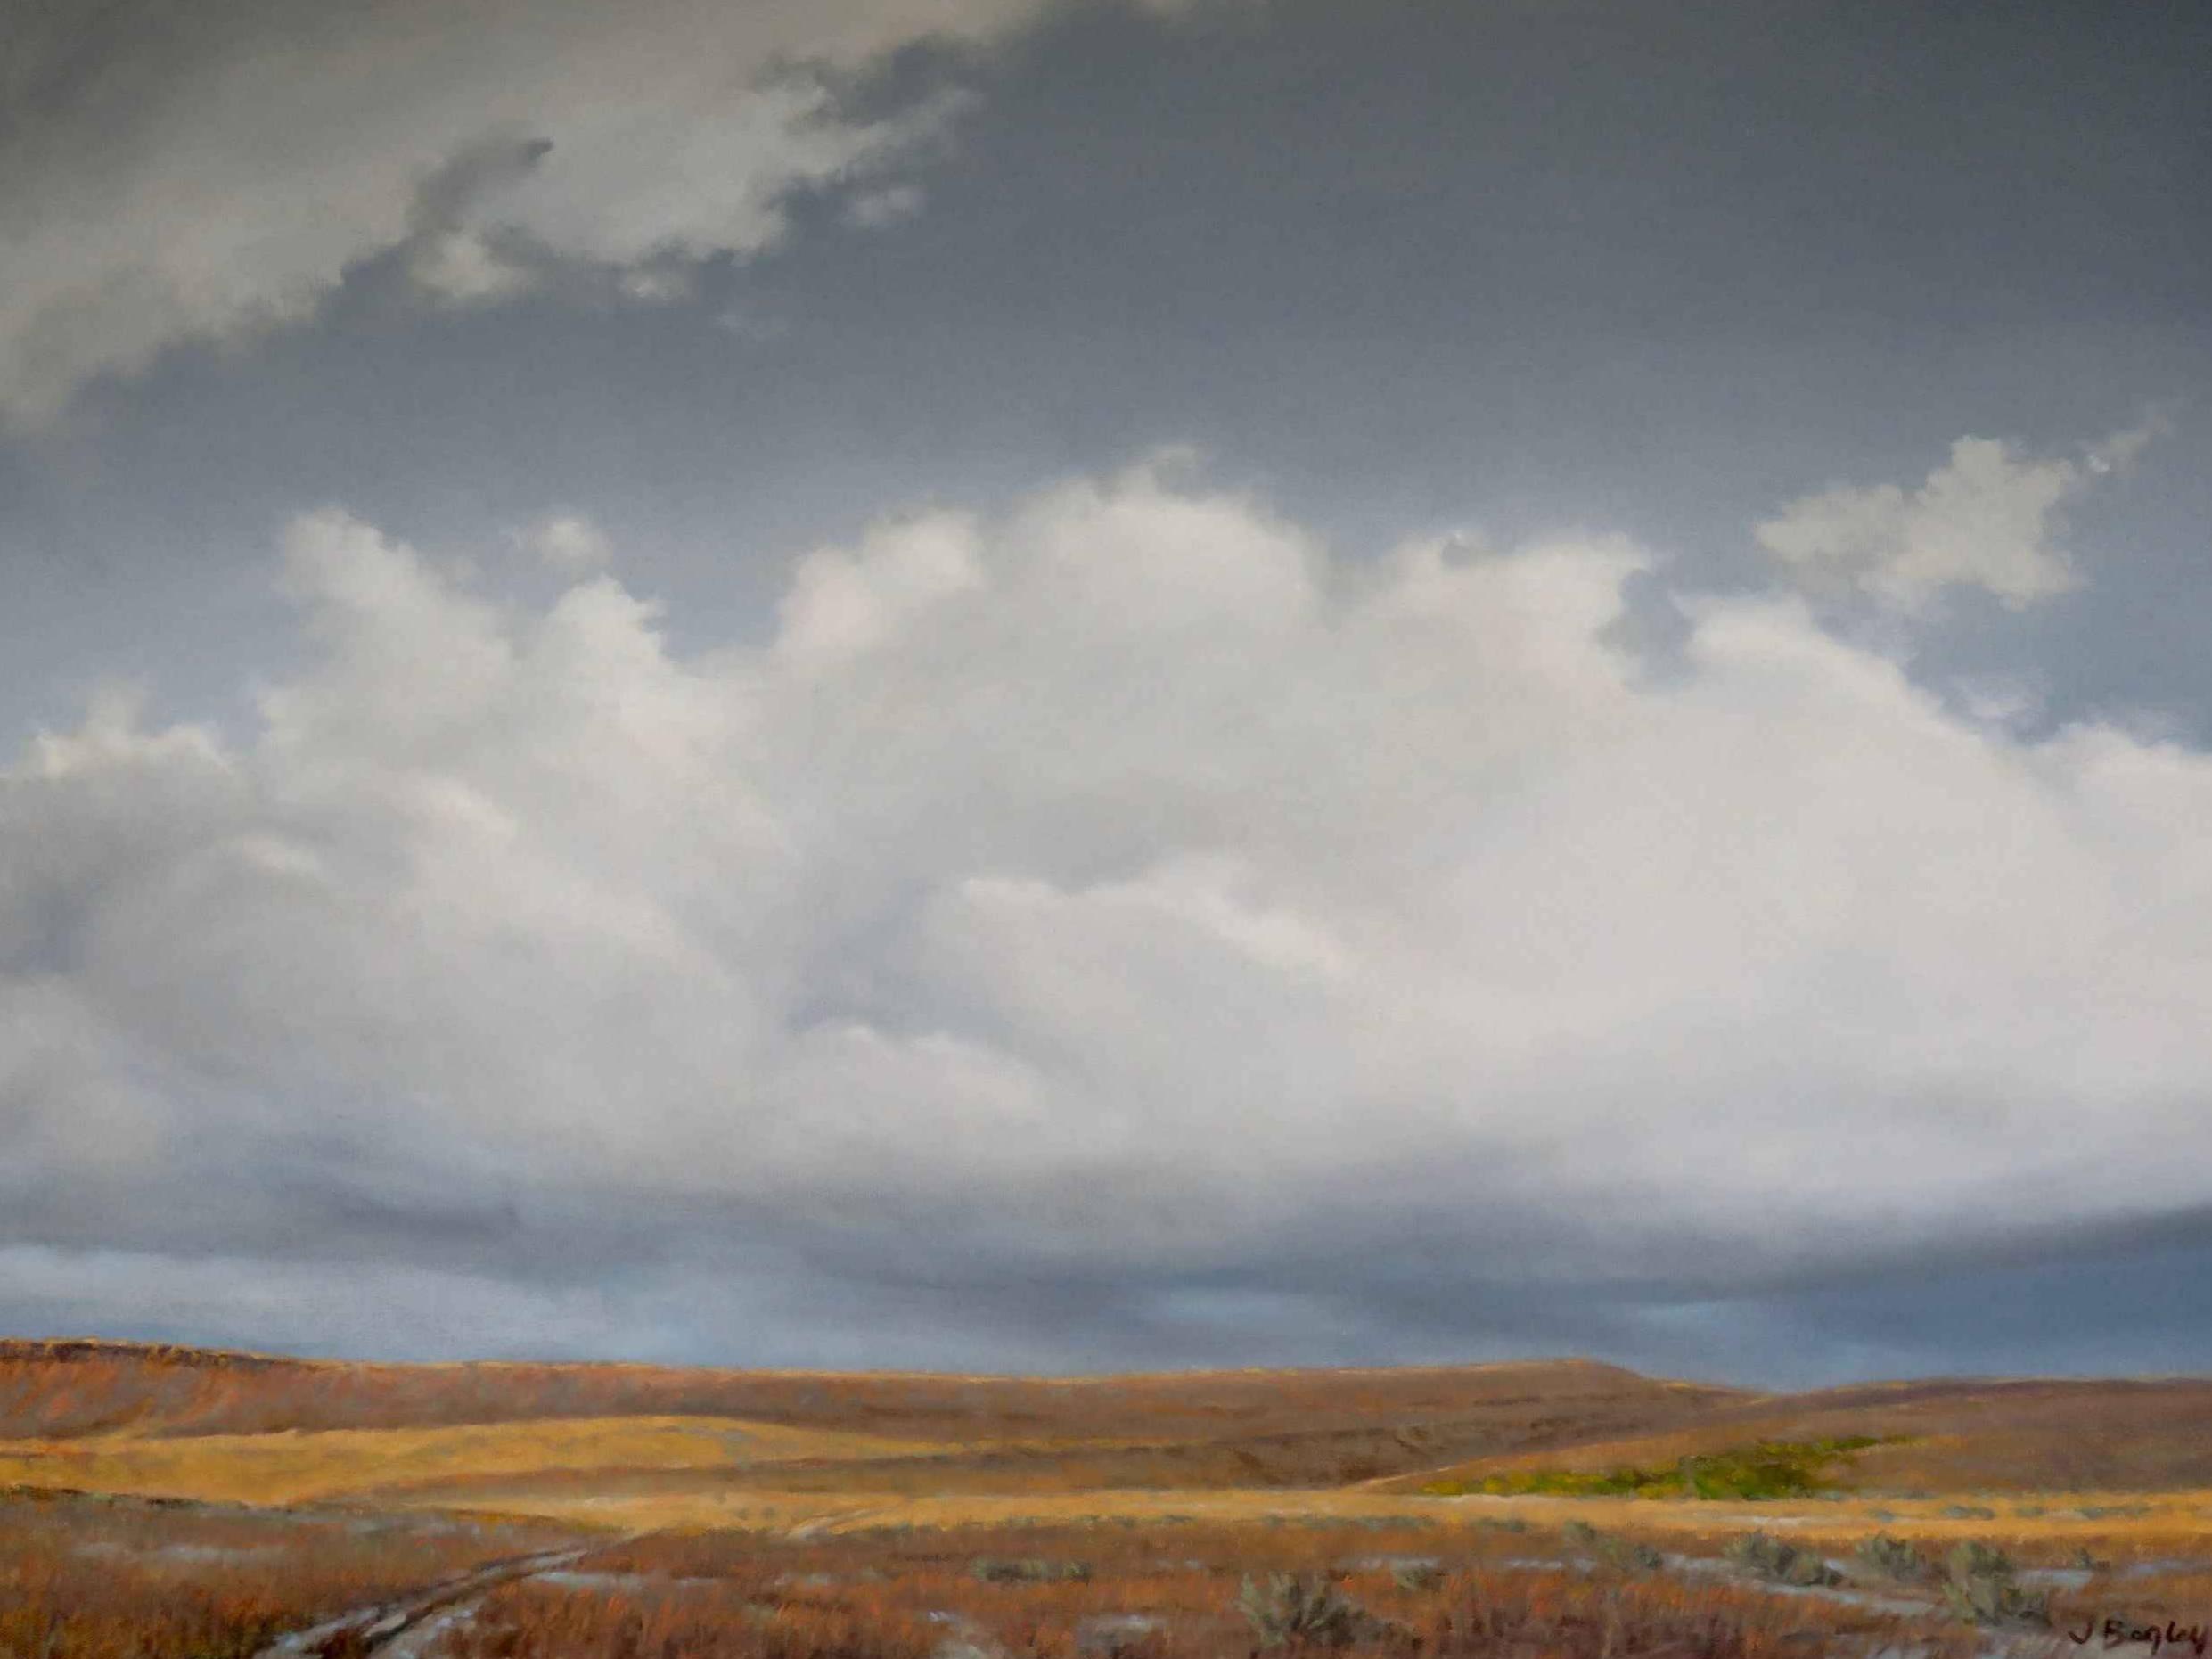 Jim Bagley. Sorrel Sky Gallery. Santa Fe Art Gallery. Maura Allen. Edward Aldrich. Kevin Red Star. Ray Hare. Durango Art Gallery.